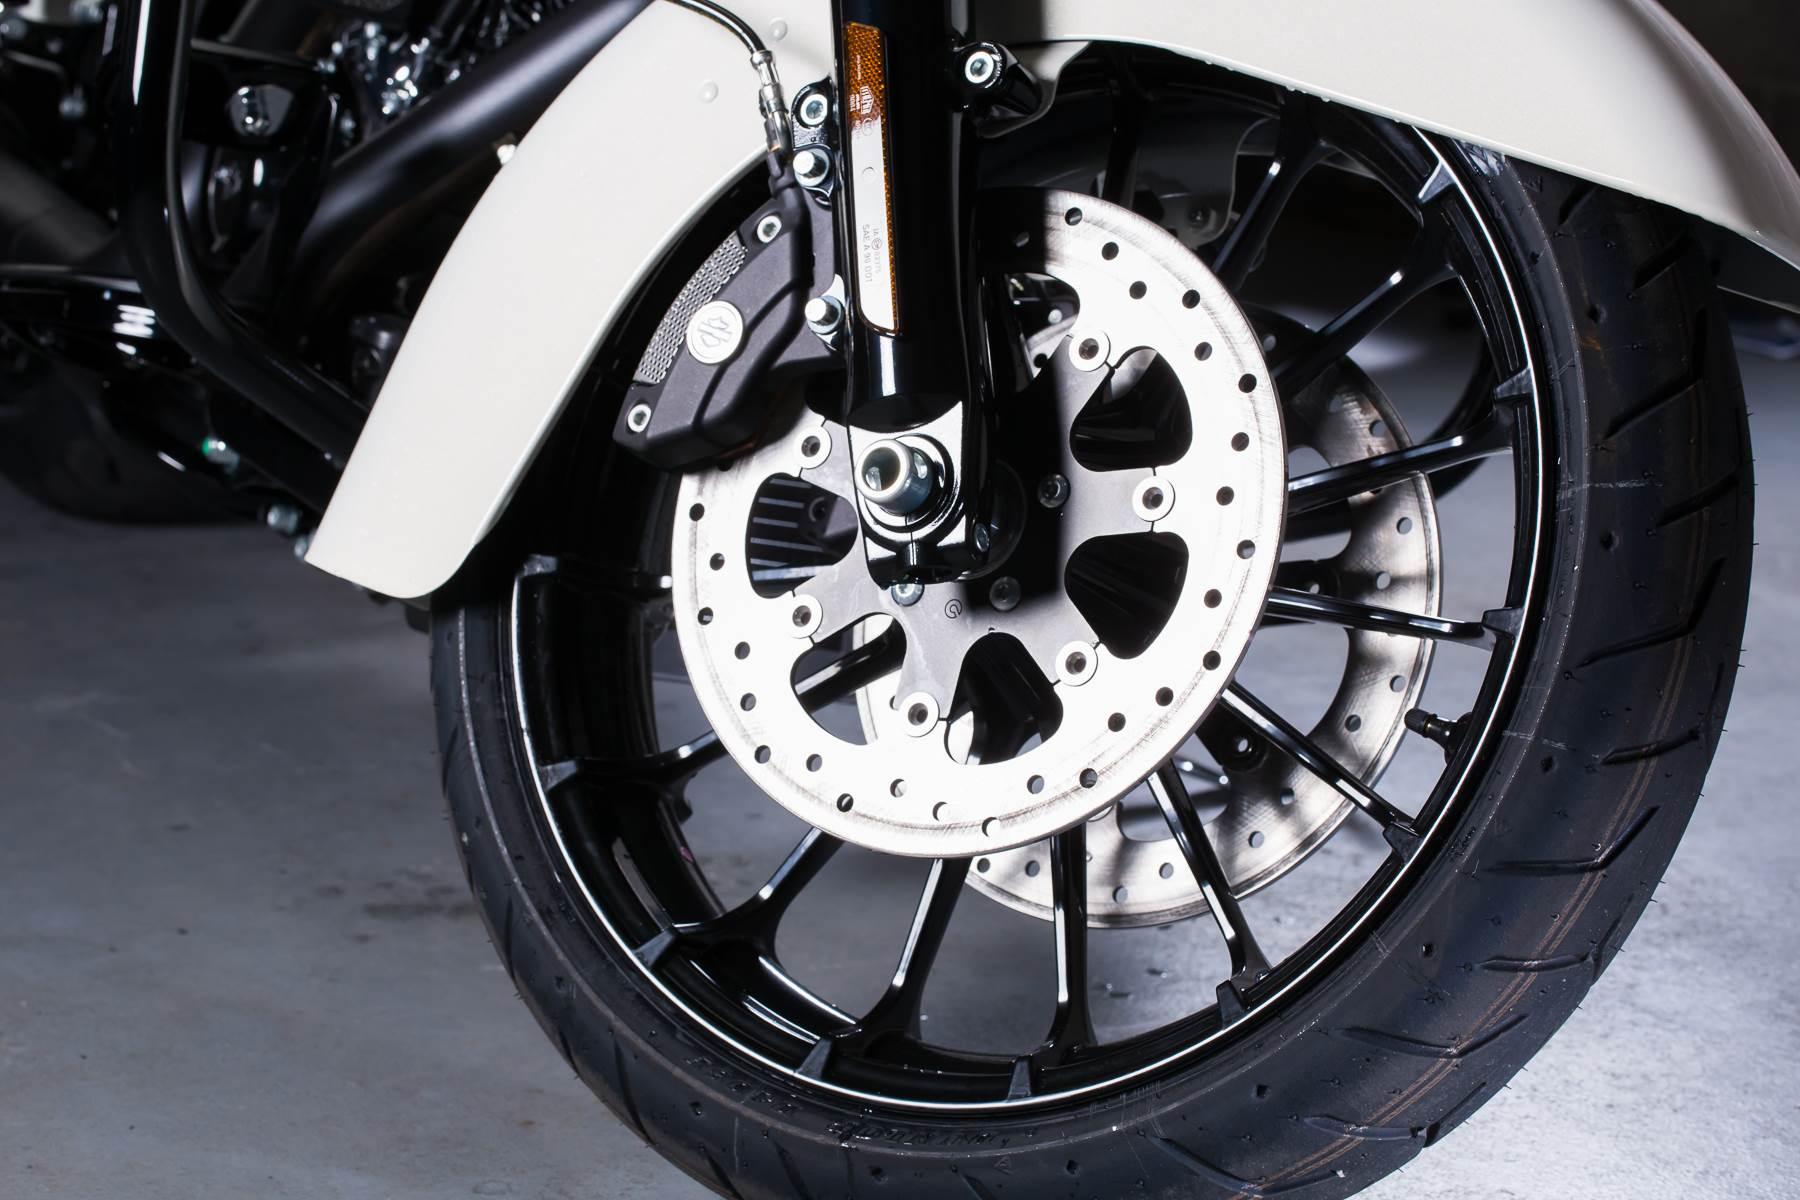 2018 Harley-Davidson Road Glide Special 5